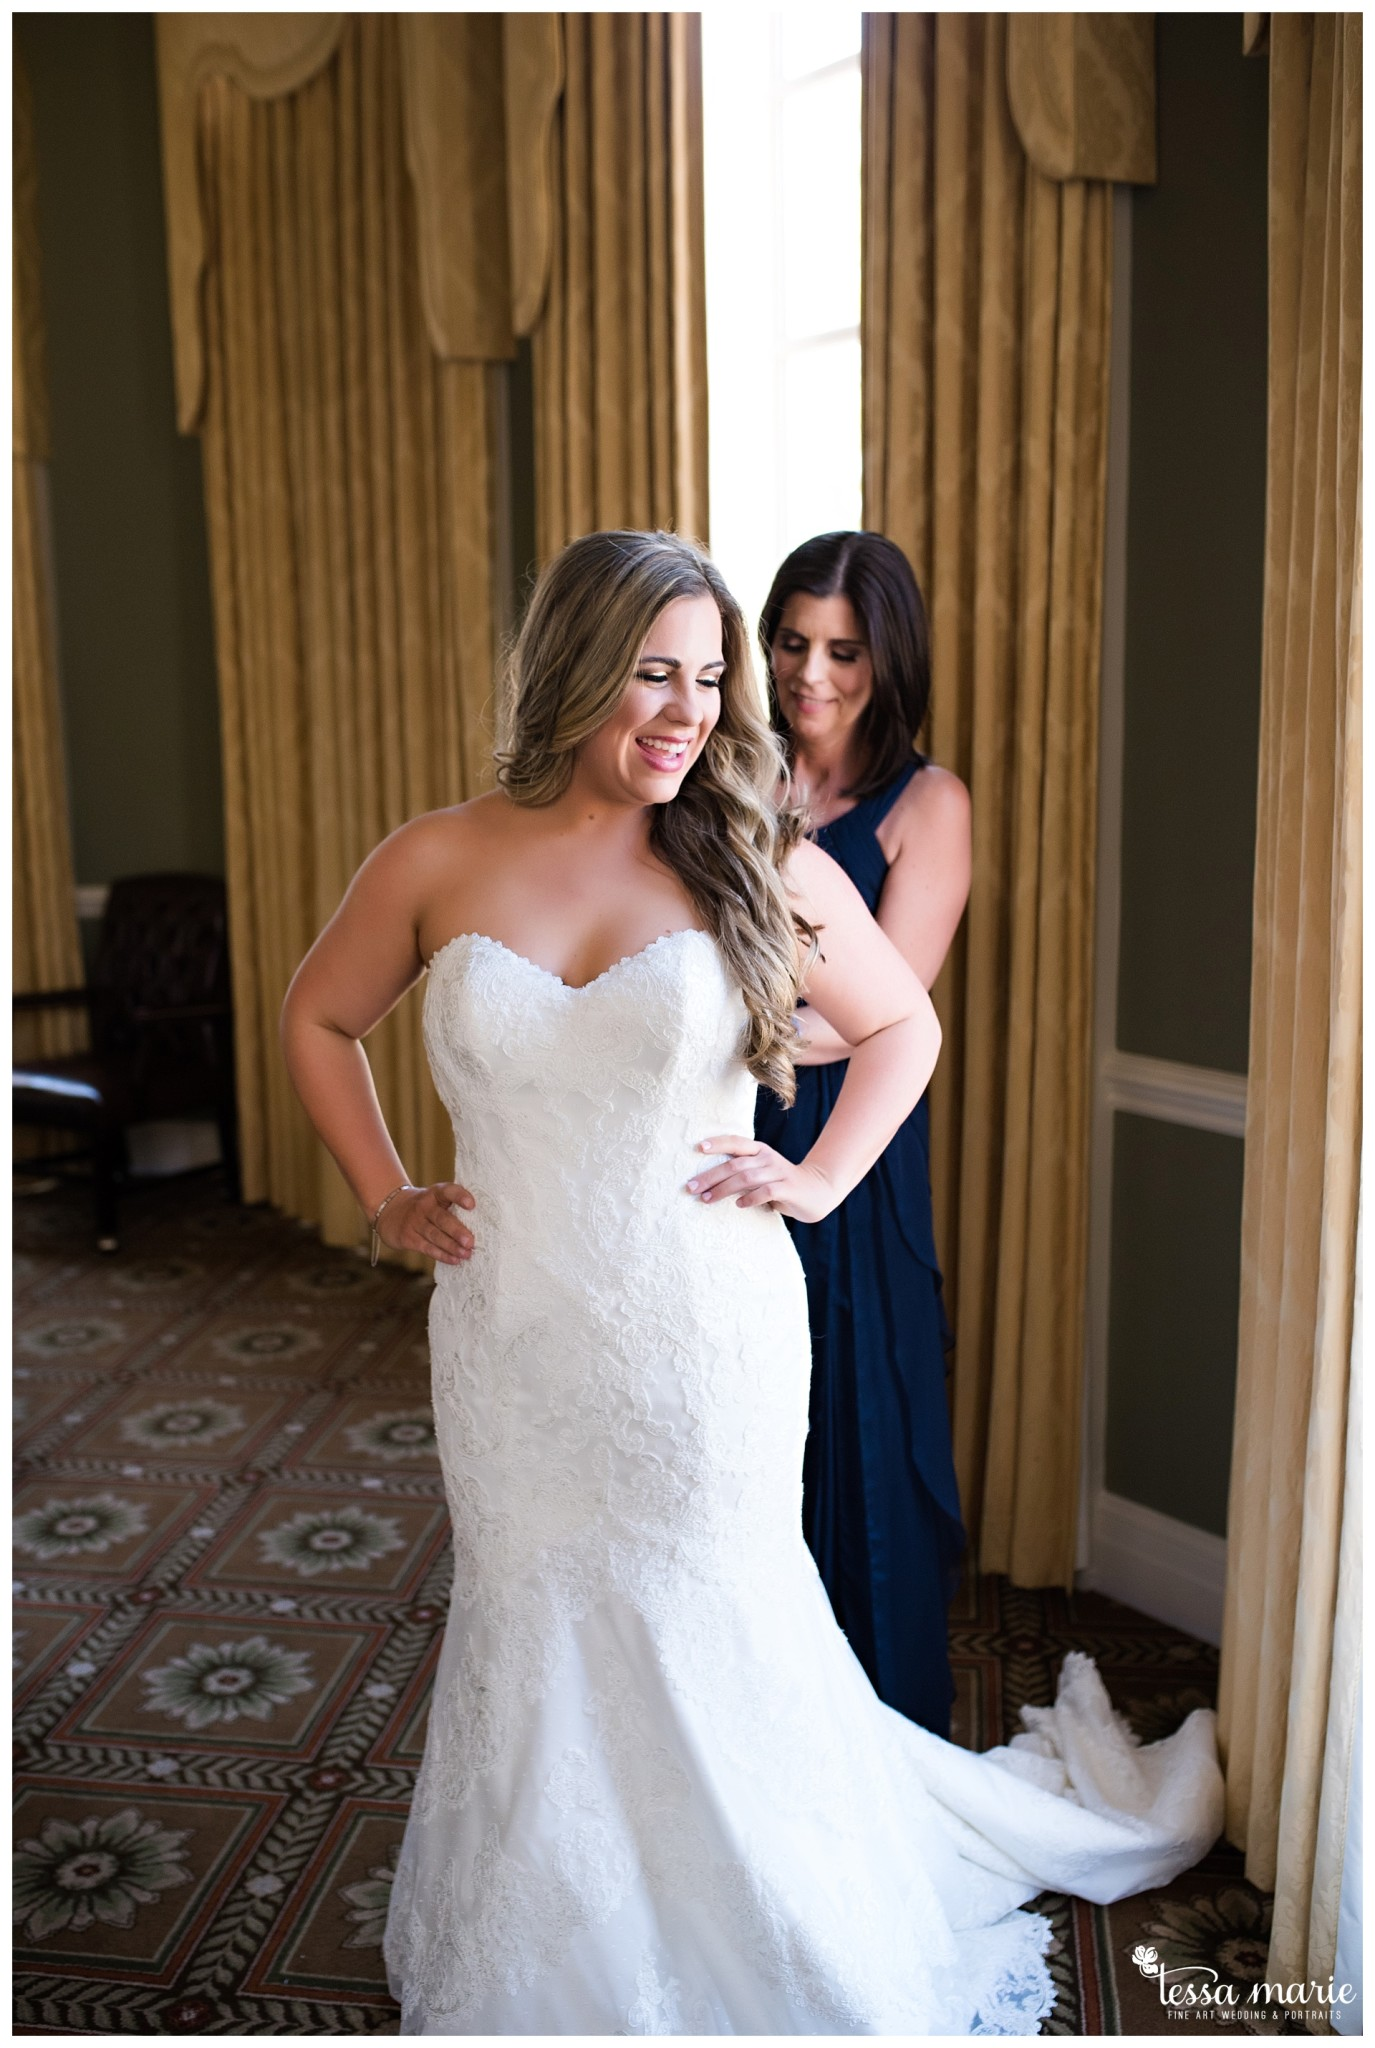 tessa_marie_weddings_legacy_story_focused_wedding_pictures_atlanta_wedding_photographer_0064